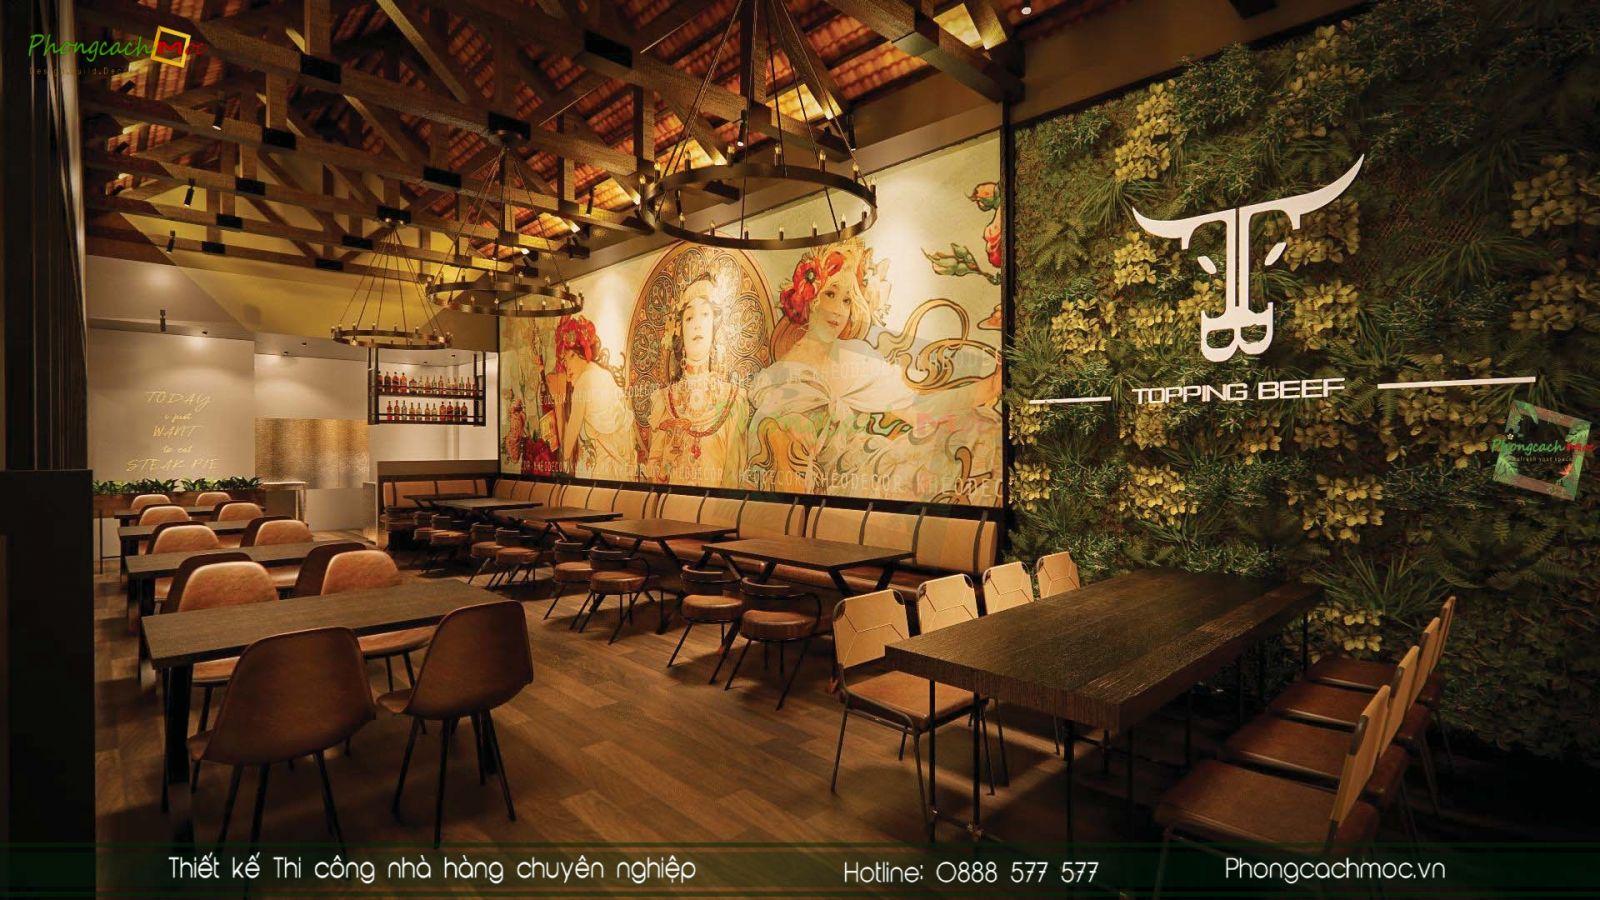 Thiet-ke-Nha-hang-The-Topping-Beef-Quan-118